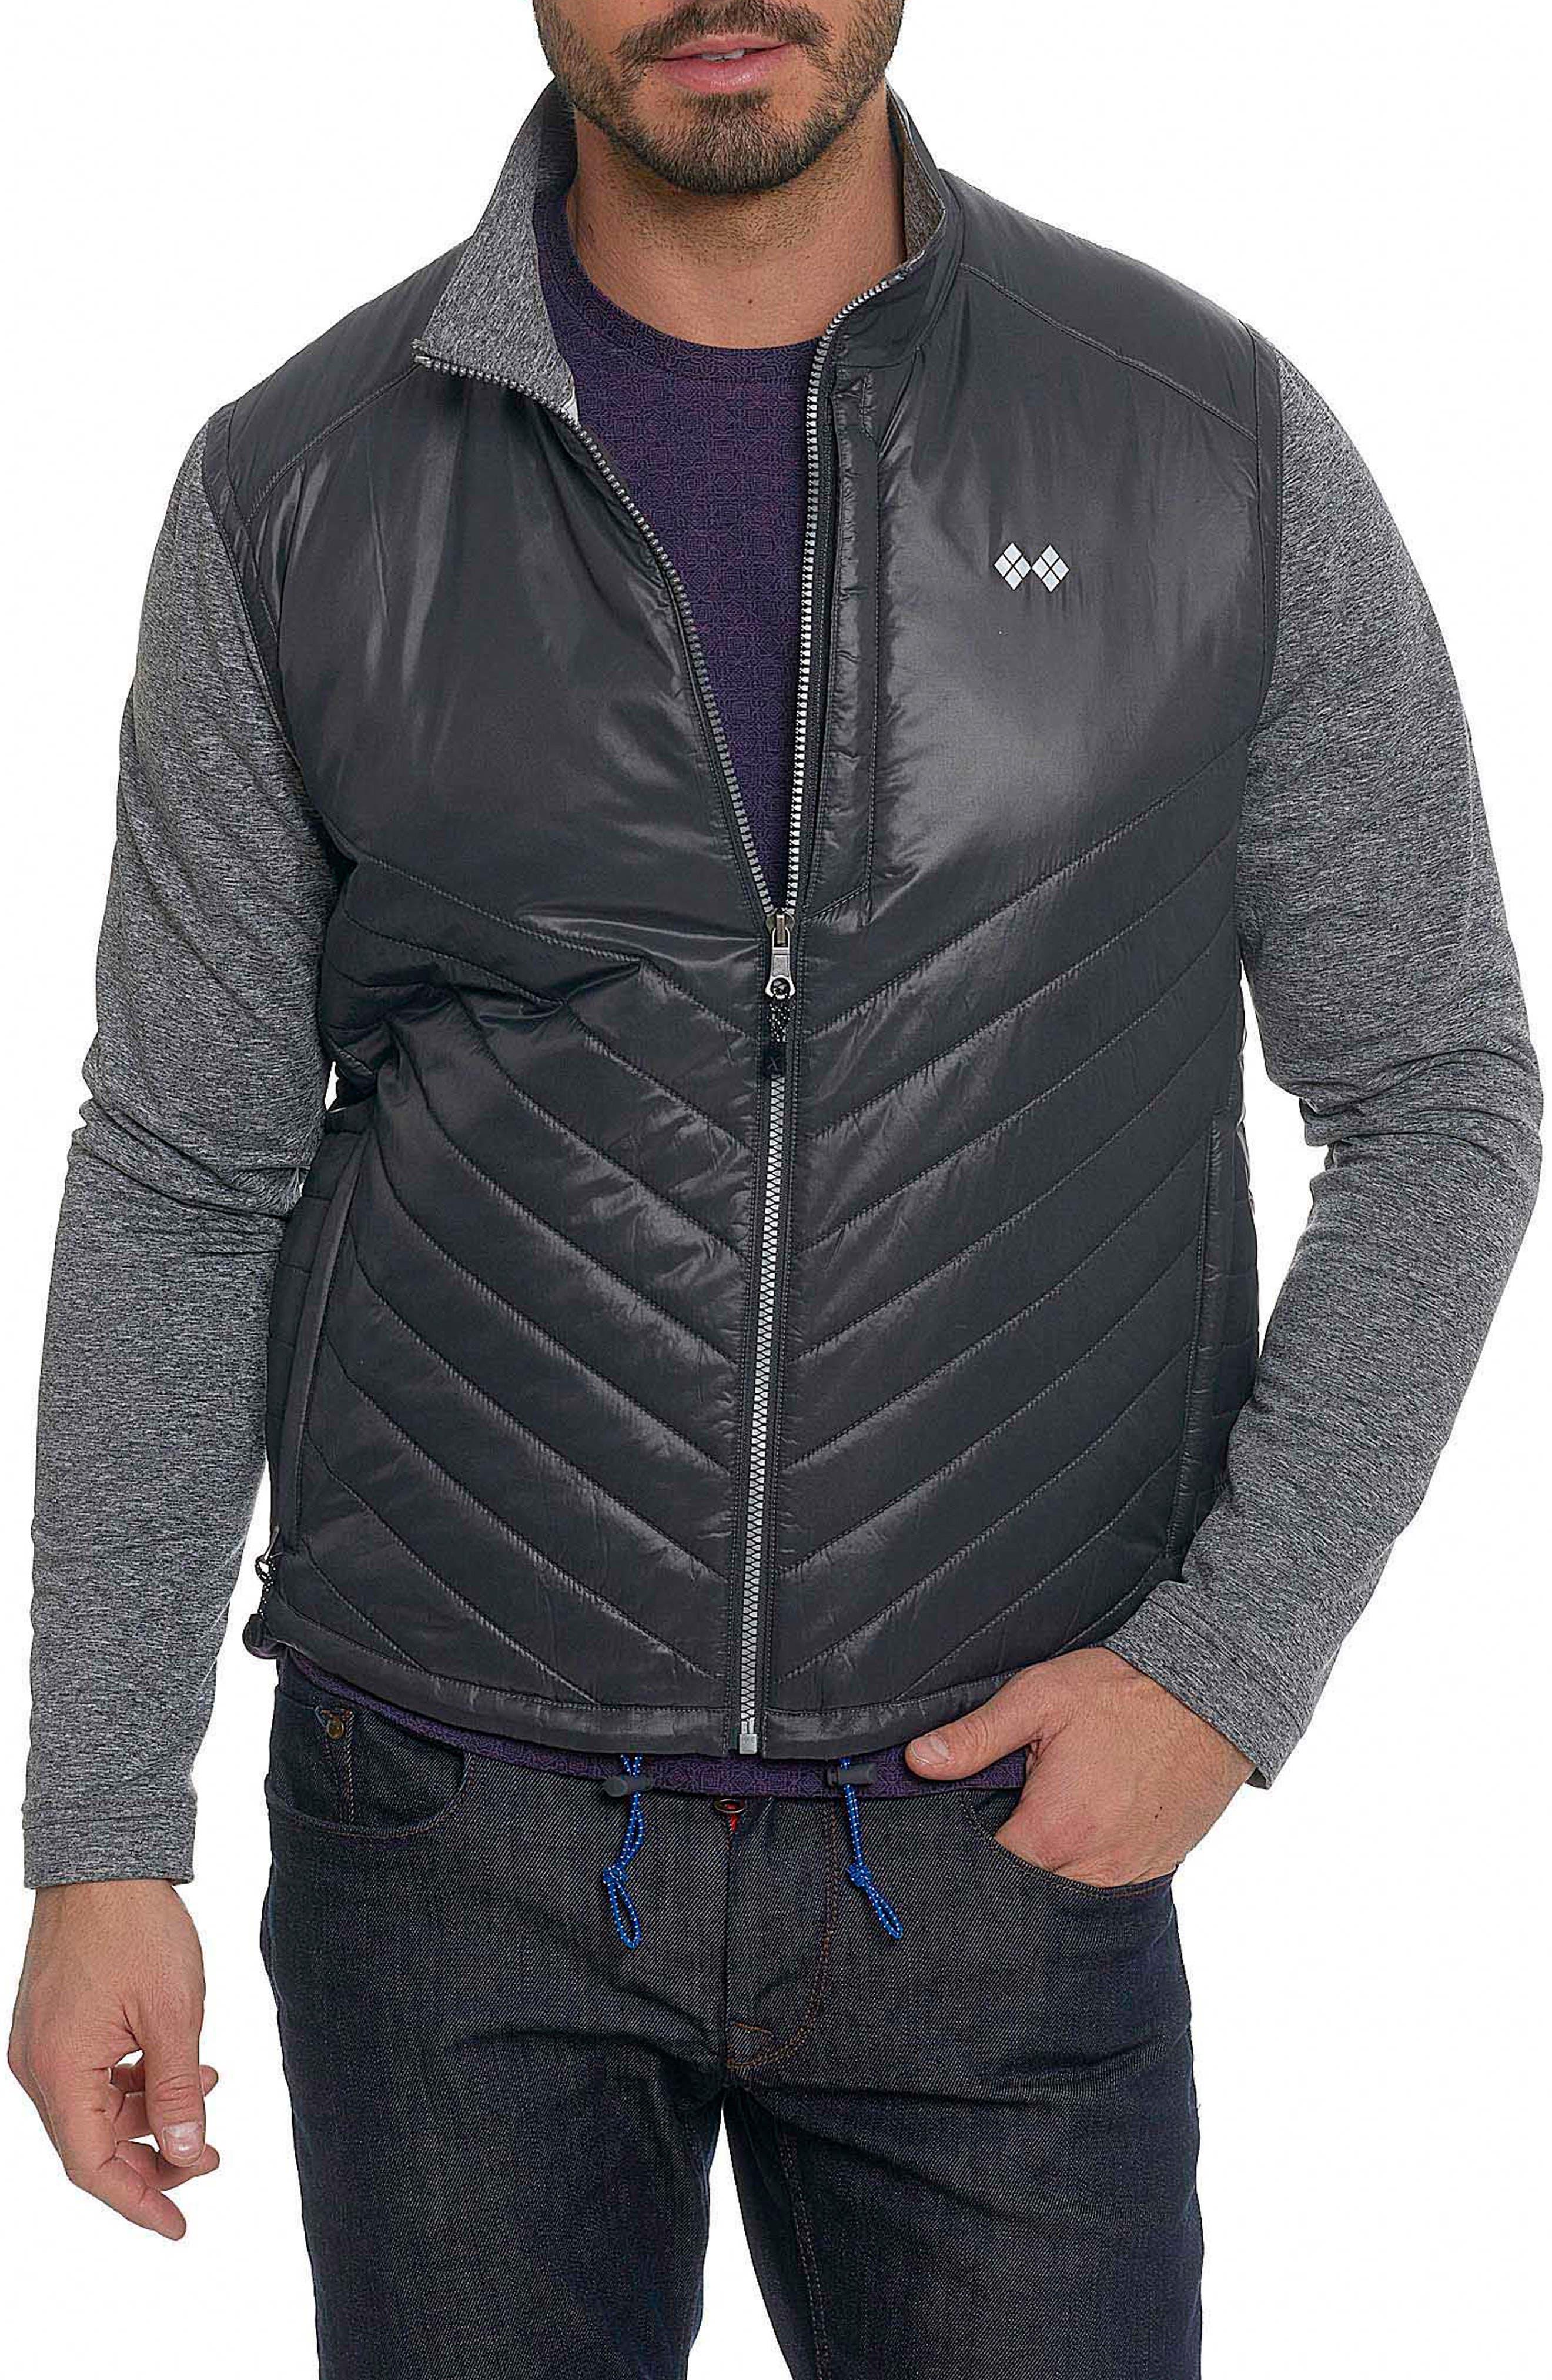 Poconos Tailored Fit Mixed Media Jacket,                             Main thumbnail 1, color,                             060